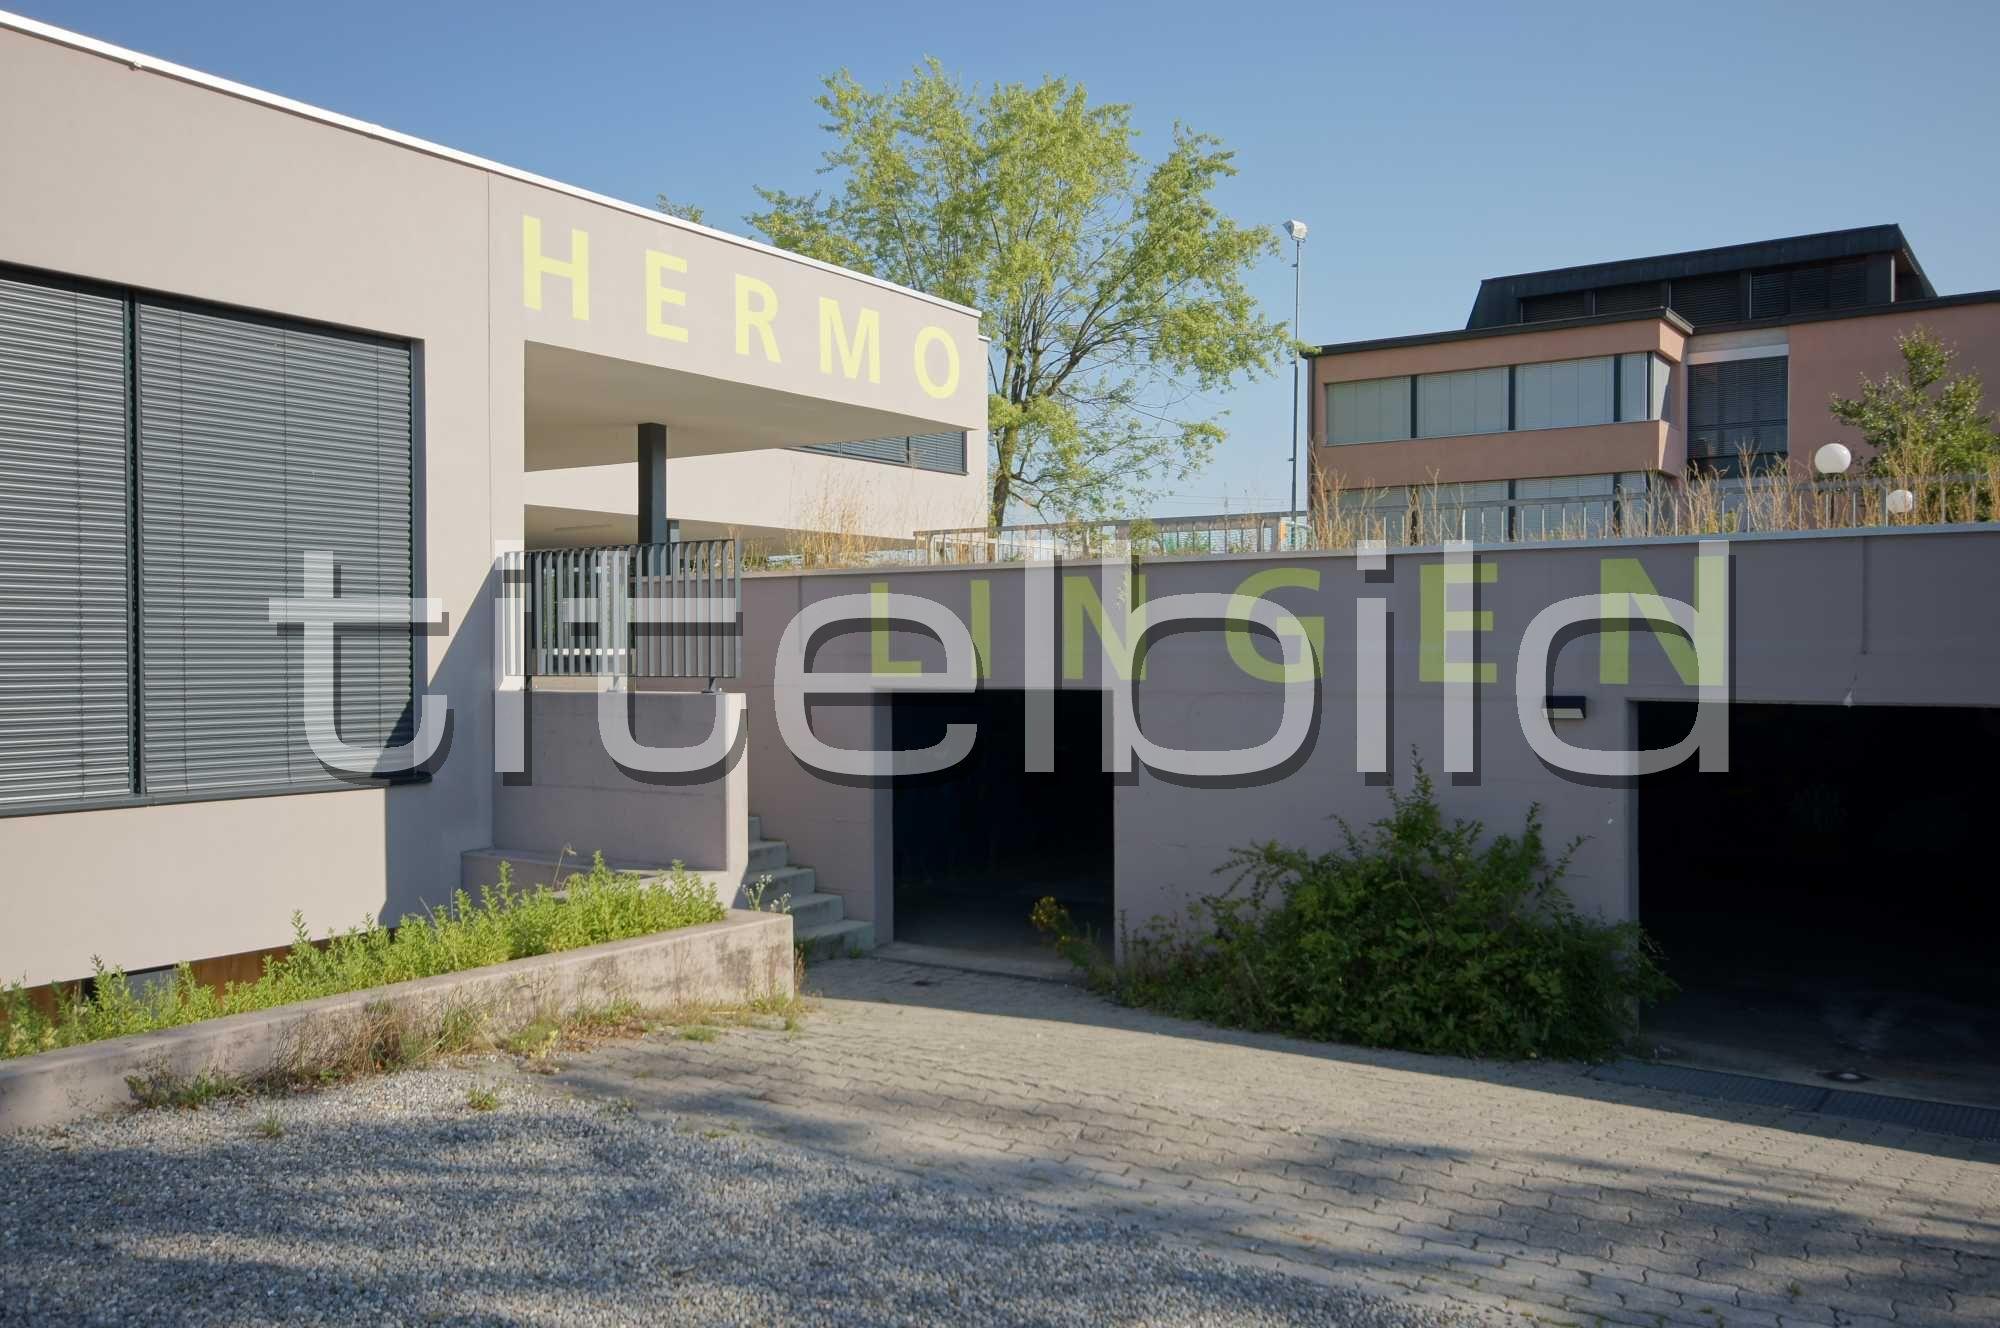 Projektbild-Nr. 2: Schulhaus Hermolingen